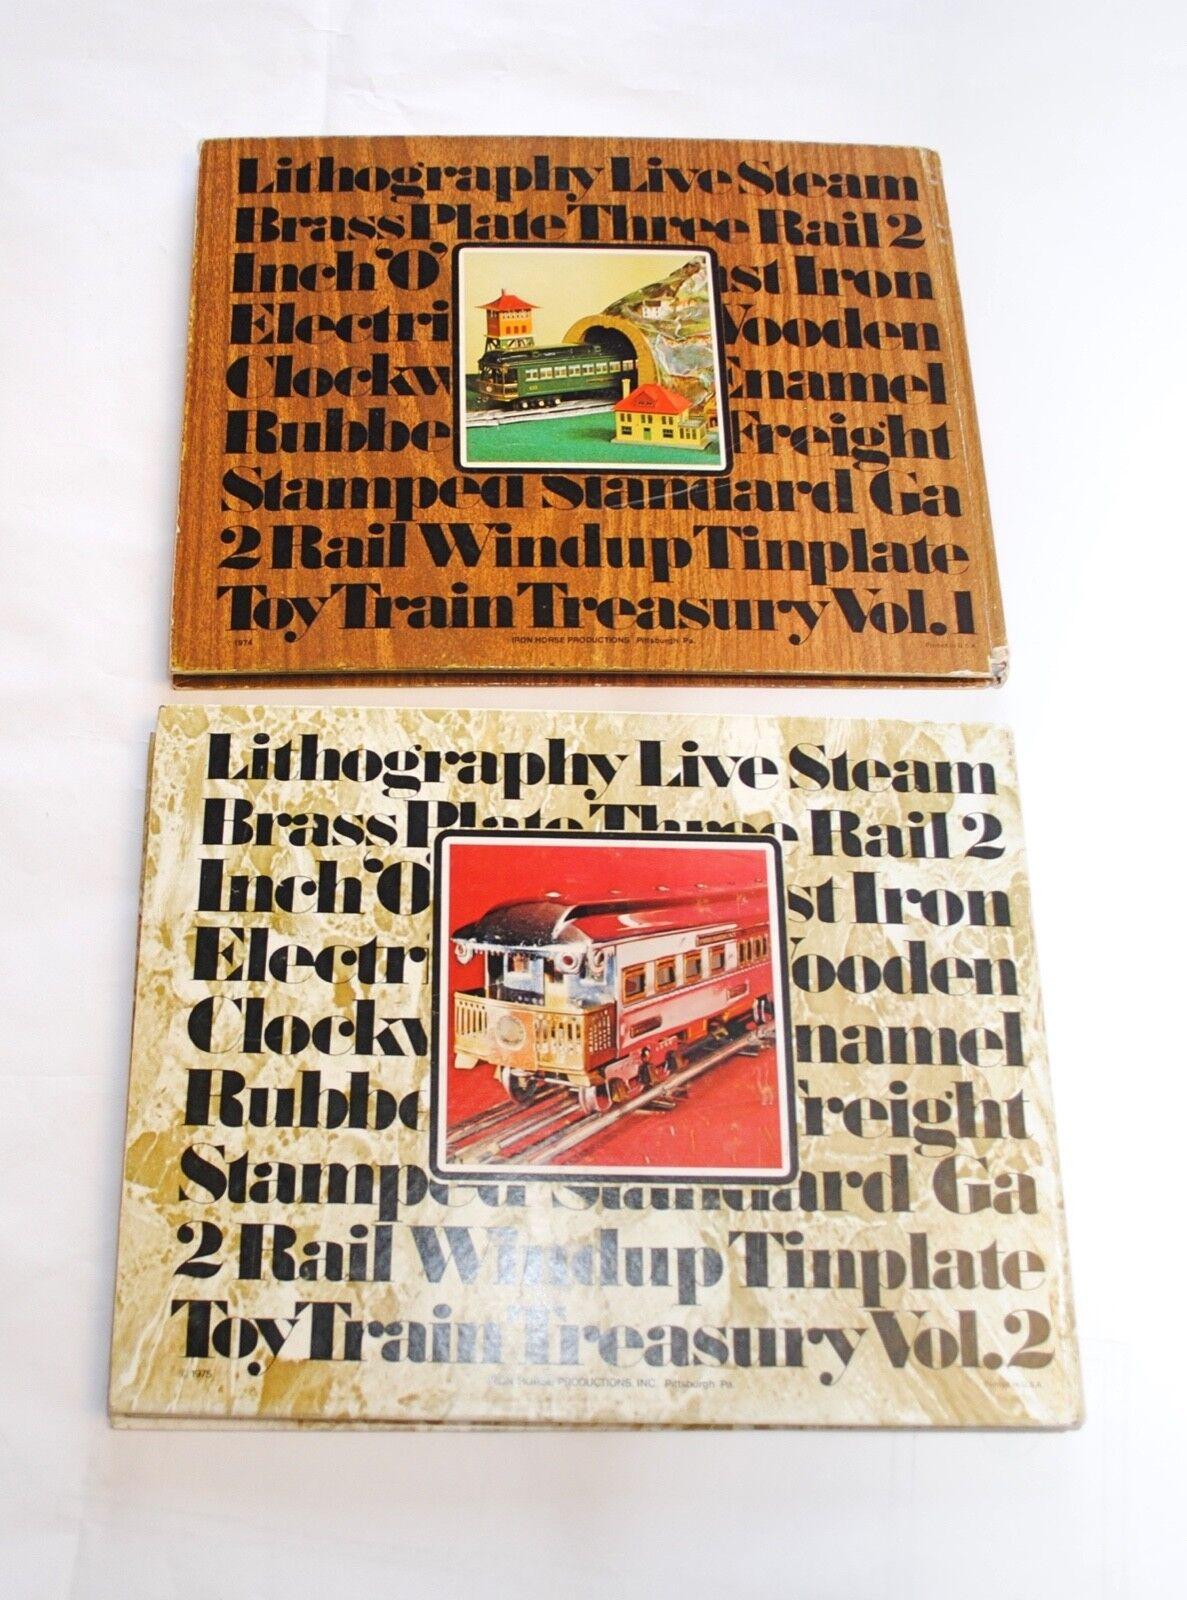 Lot of 2 Toy Train Treasury Volume 1 and 2 Hardcover Books Glenn A. Feech Signed